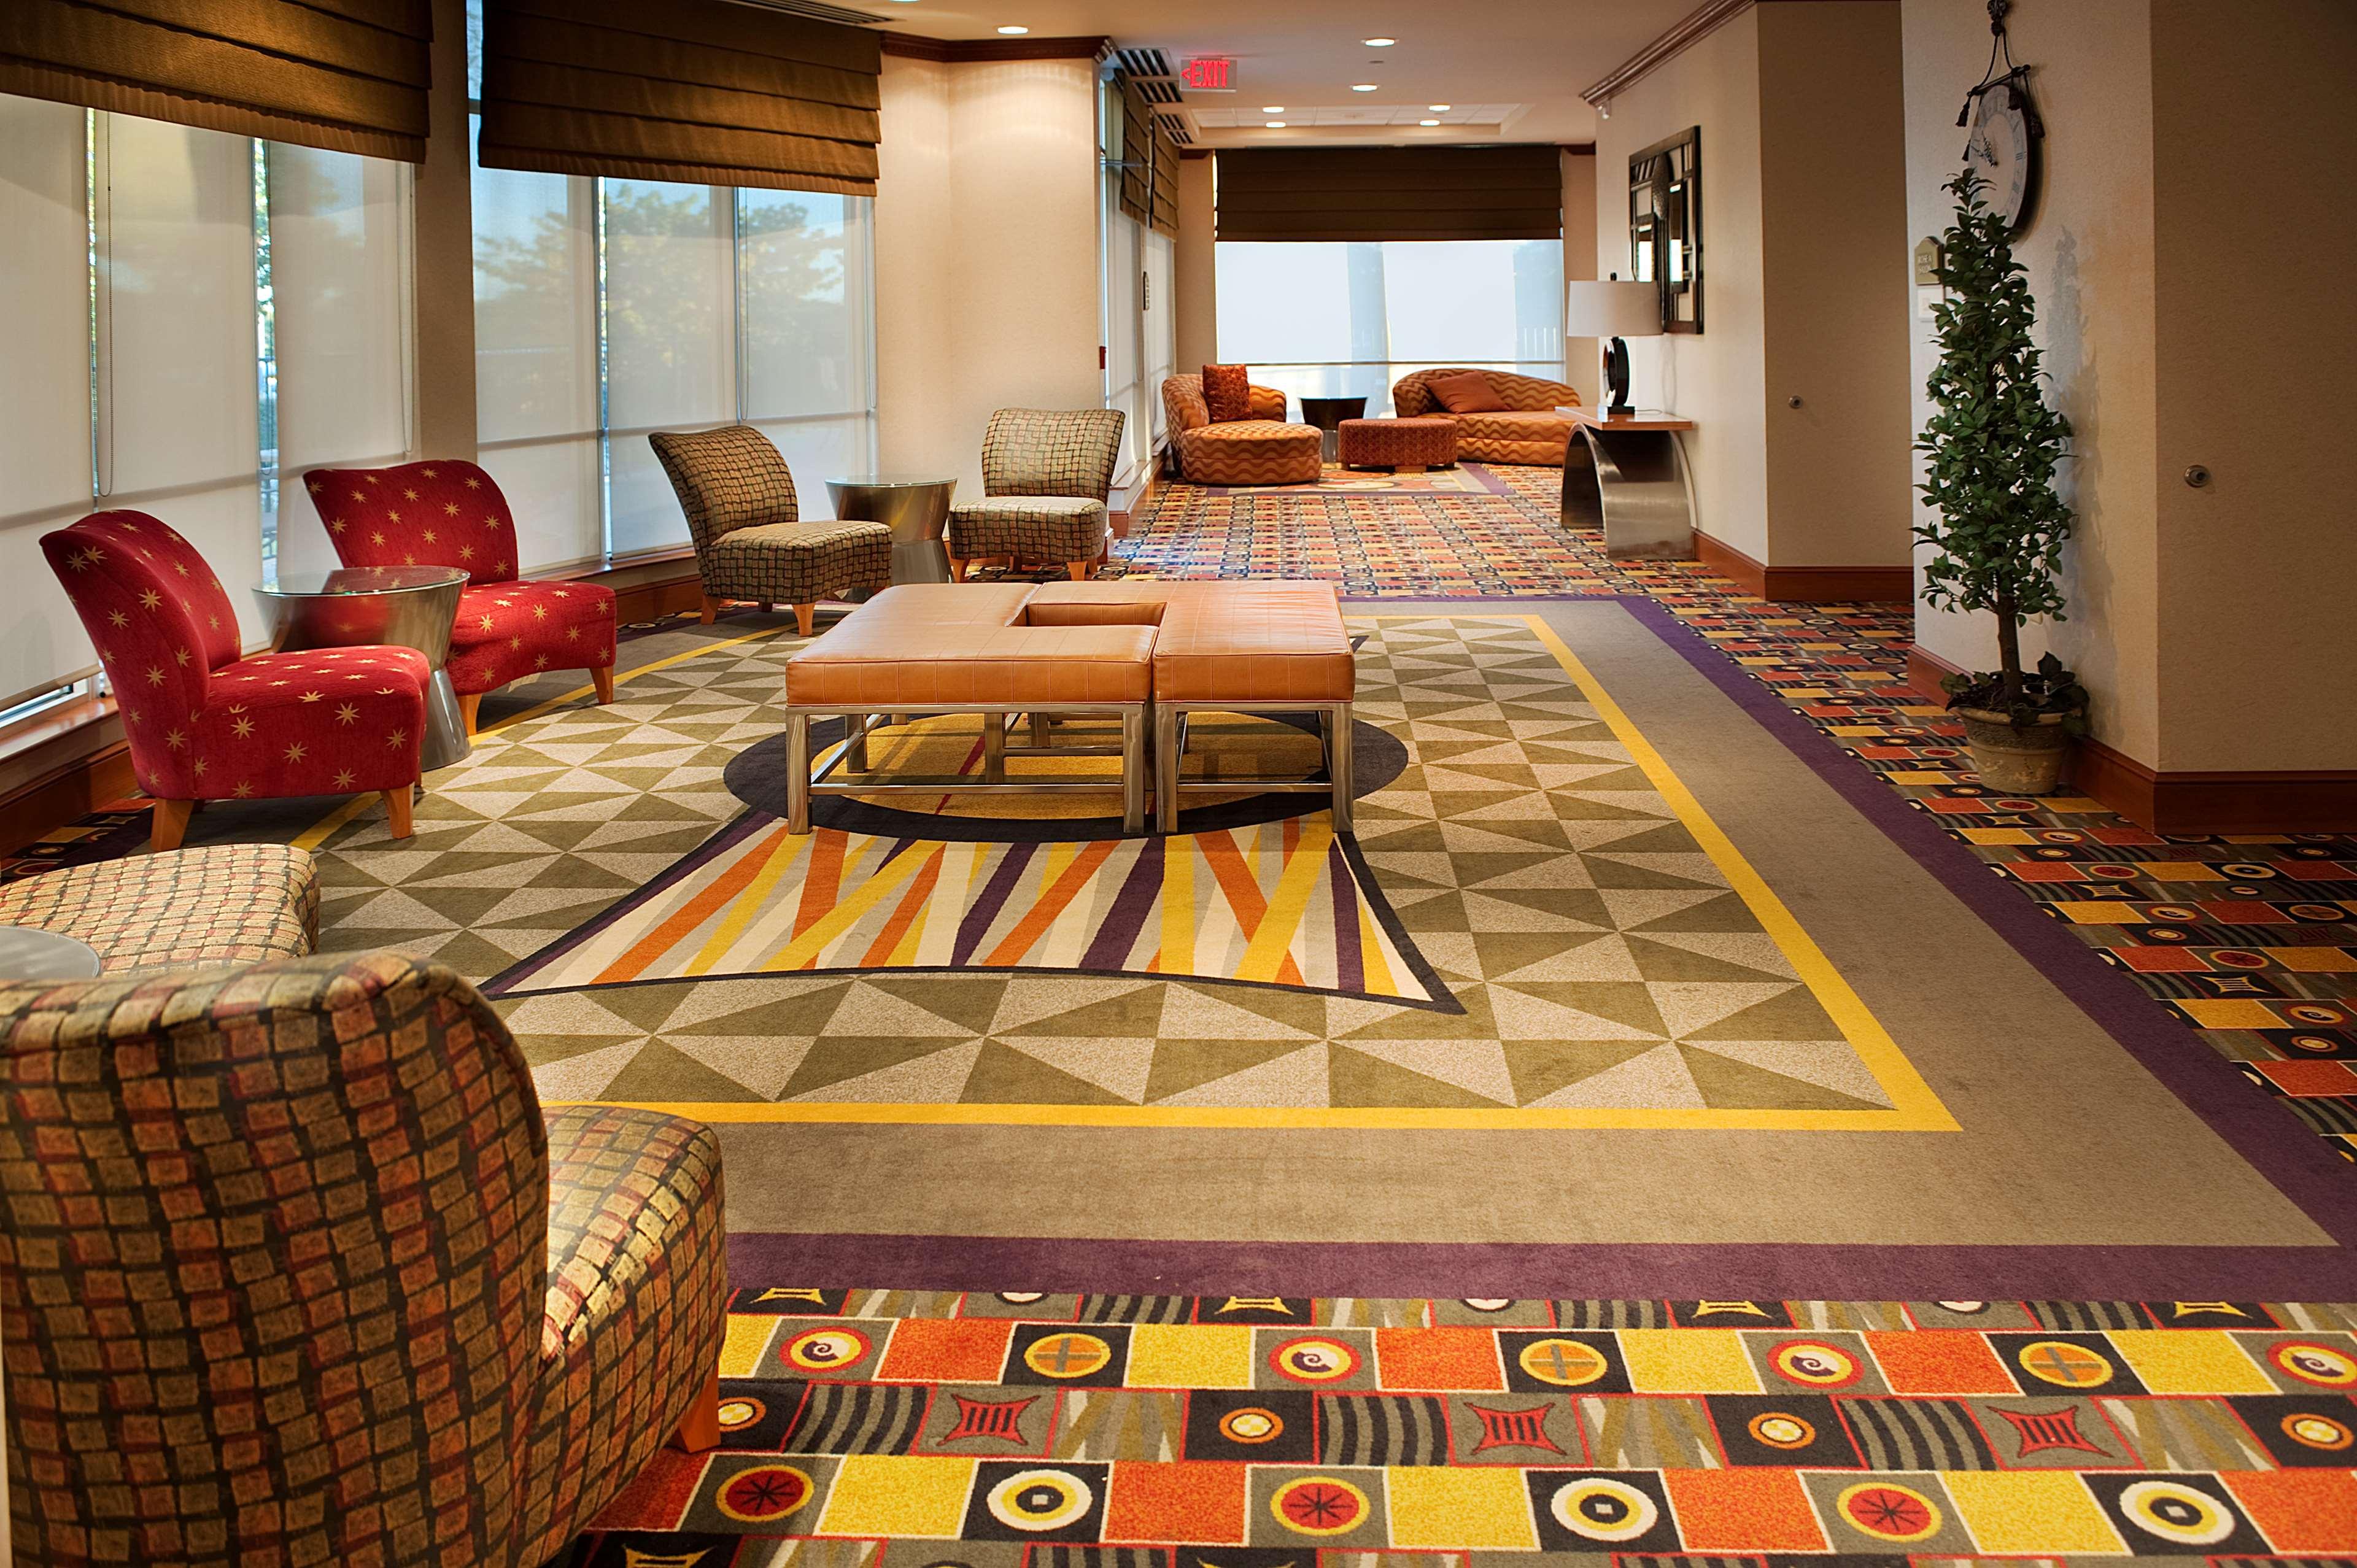 Hilton Garden Inn DFW Airport South image 46